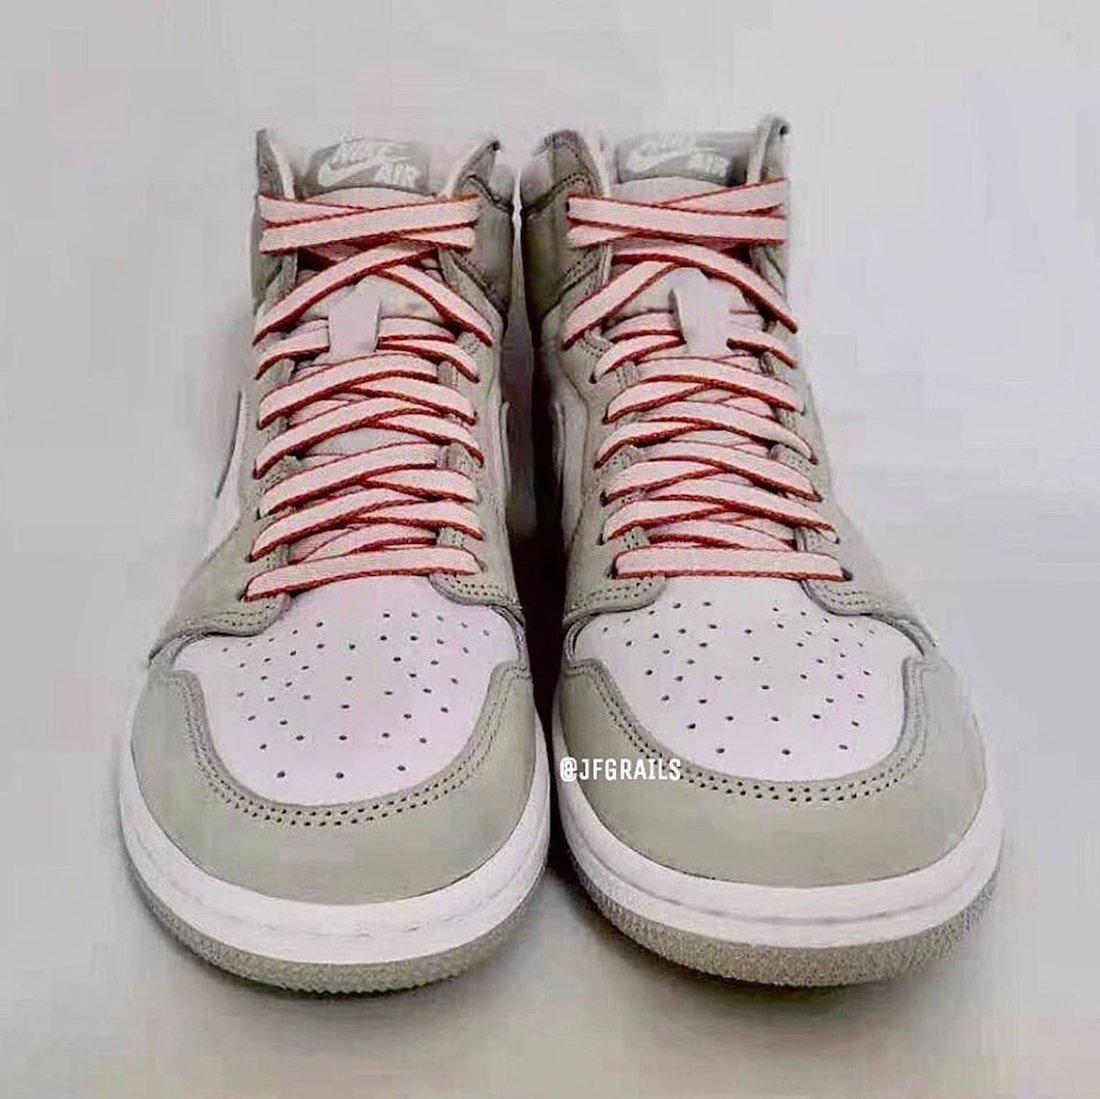 Womens Air Jordan 1 Seafoam Healing Orange CD0461-002 Release Date